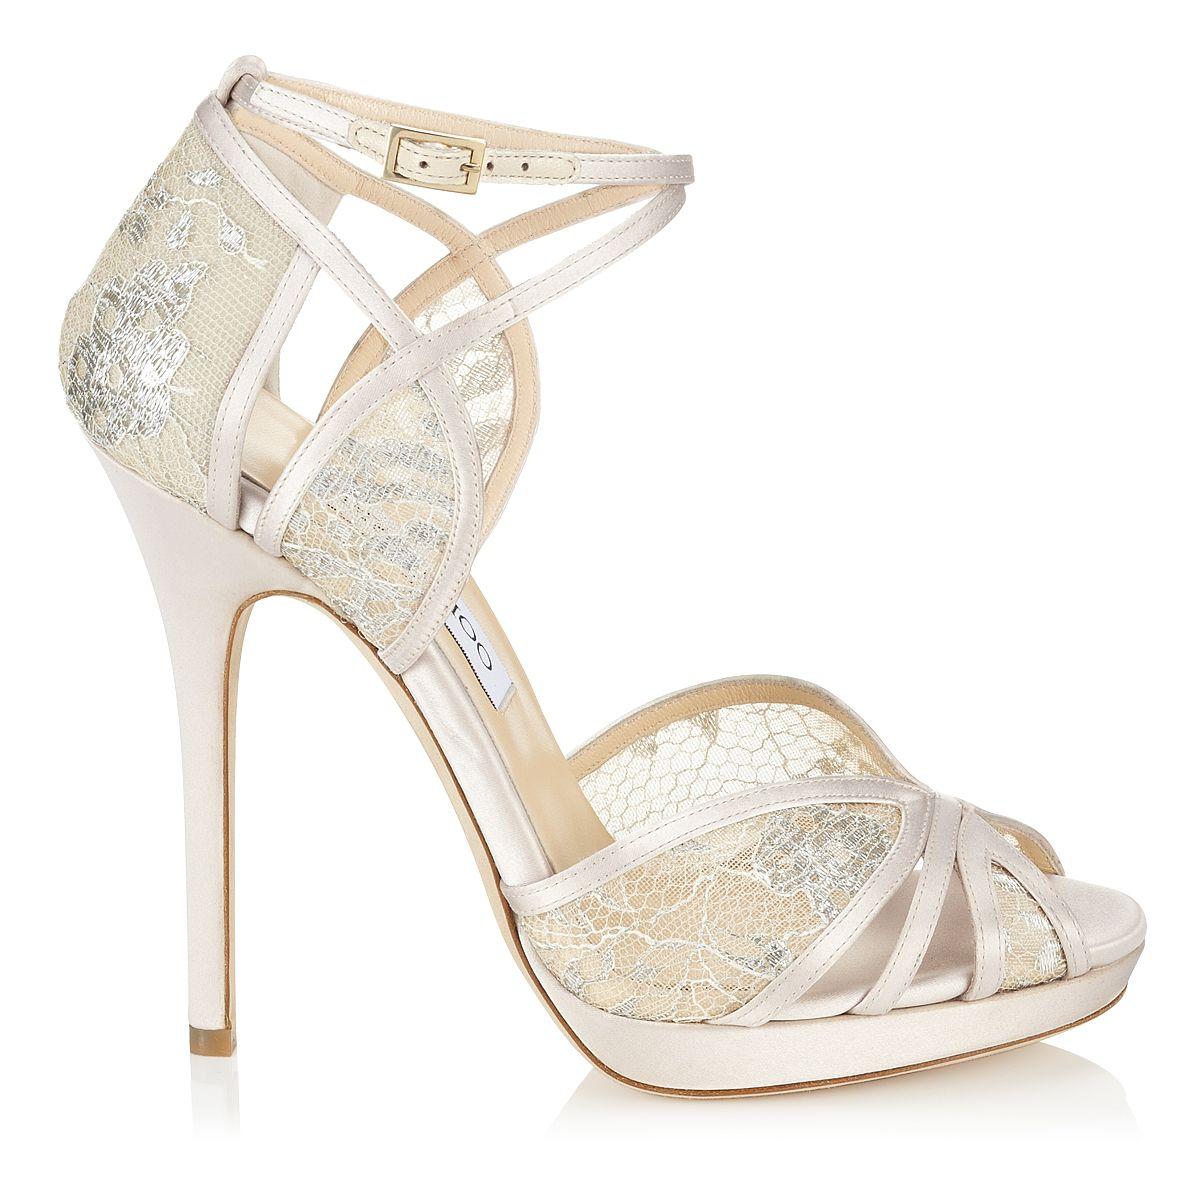 jimmy choo wedding shoes Wedding shoes to die for by Jimmy Choo JimmyChoo weddingshoes shoes